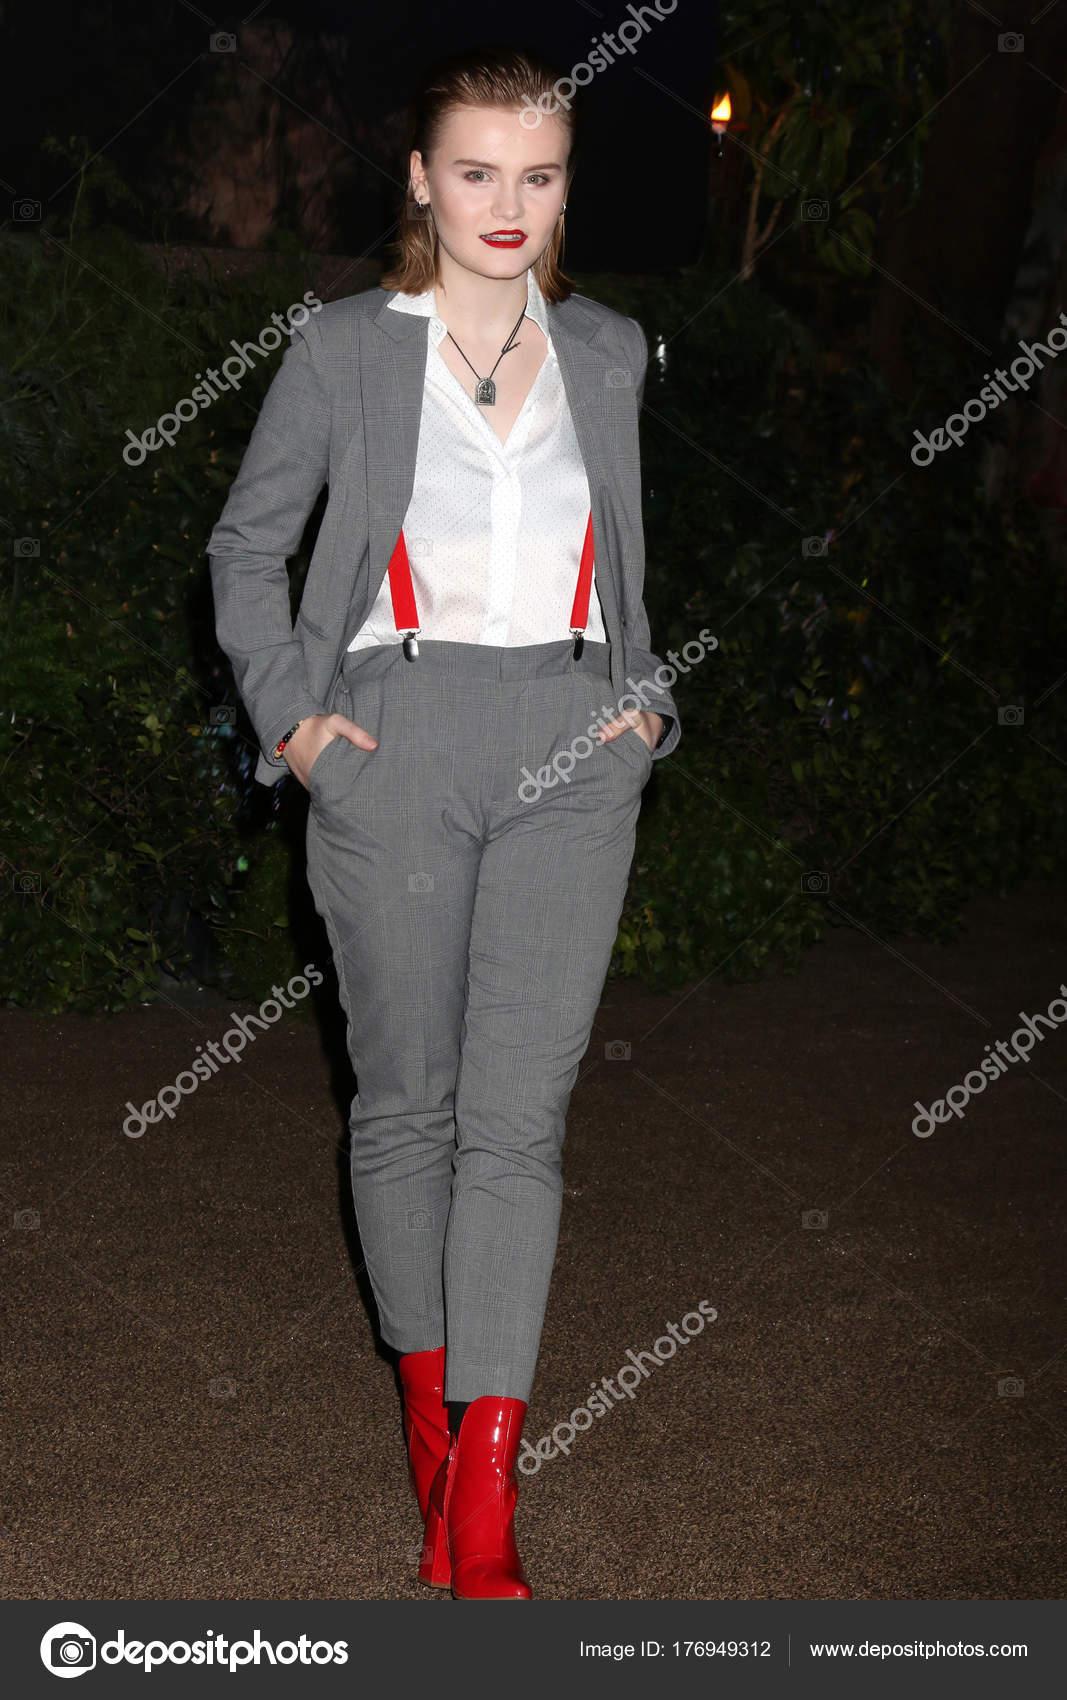 Sheila Kelley (American actress),Olga Lowe Hot pictures Michael J. Fox,Jennifer Bishop